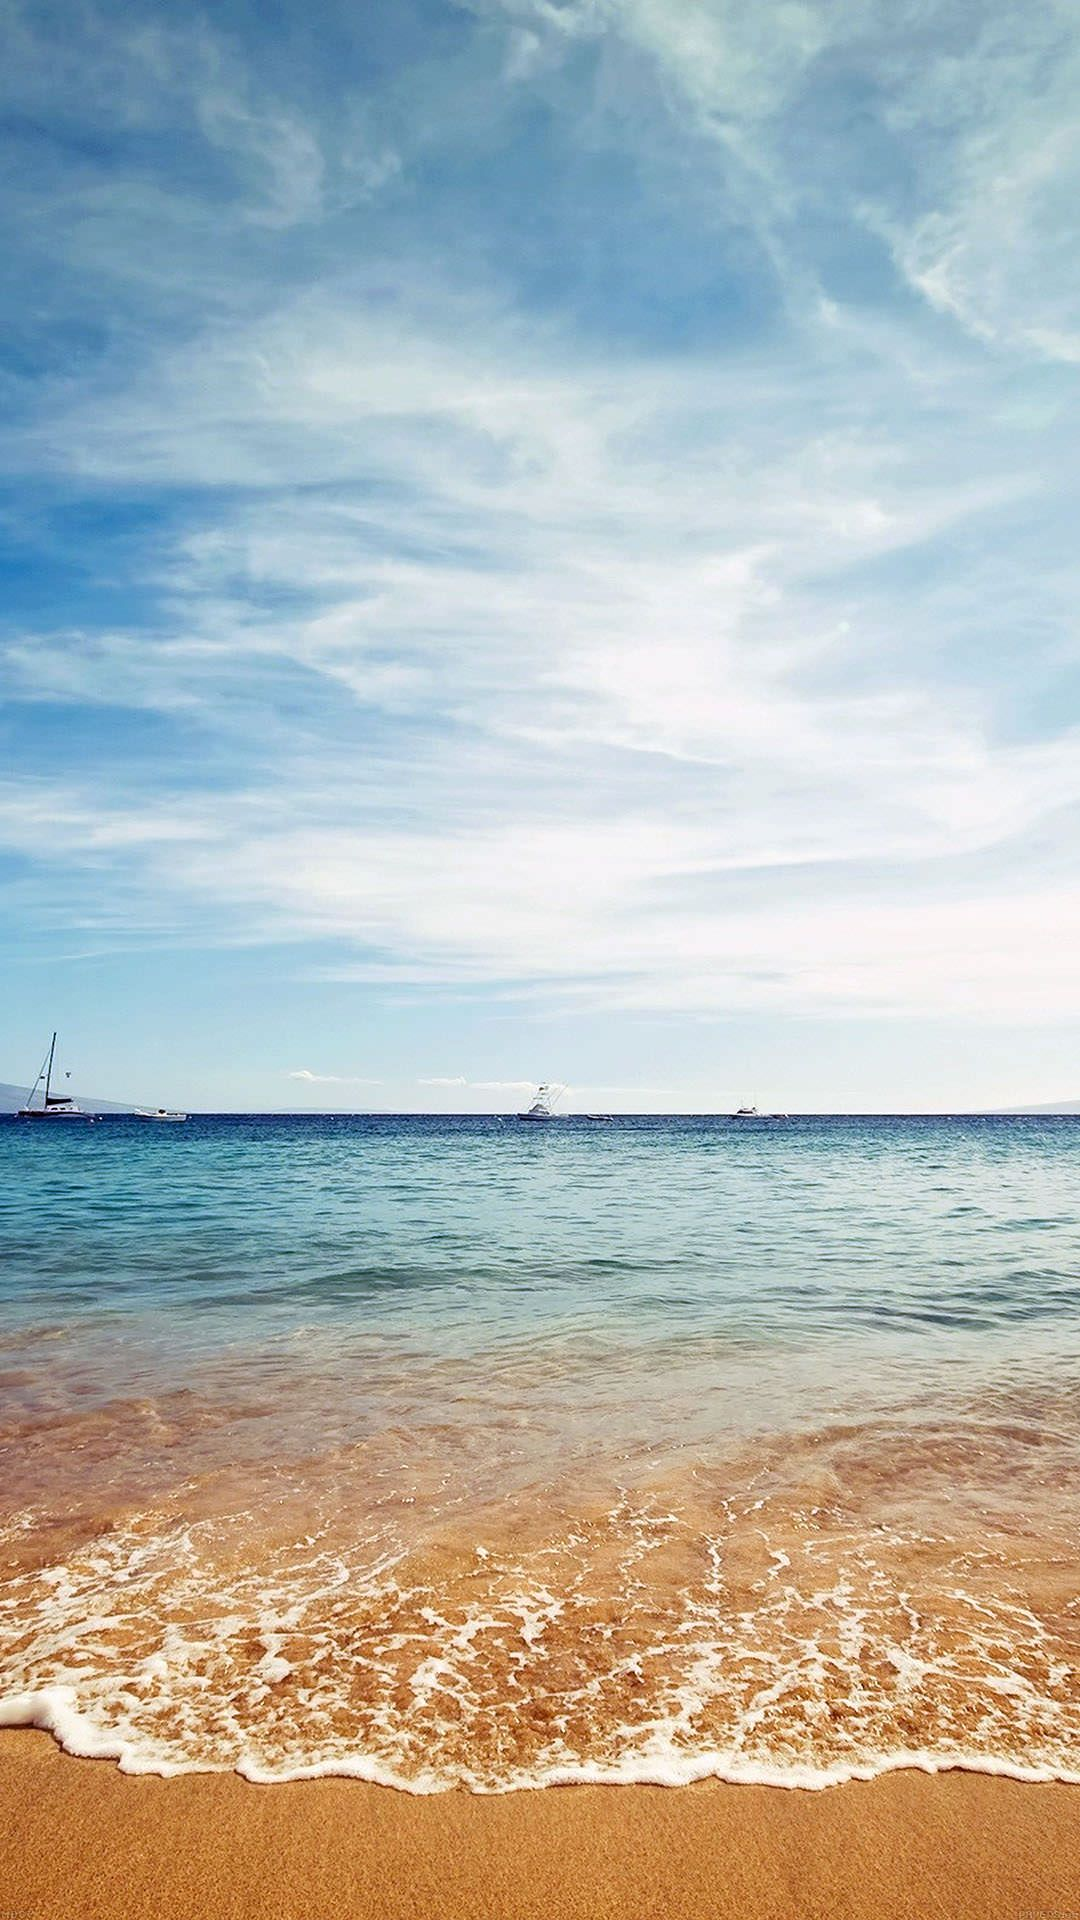 Iphone Xr Wallpaper 4k Beach Mywallpapers Site Beach Wallpaper Iphone Beach Wallpaper Iphone 5s Wallpaper